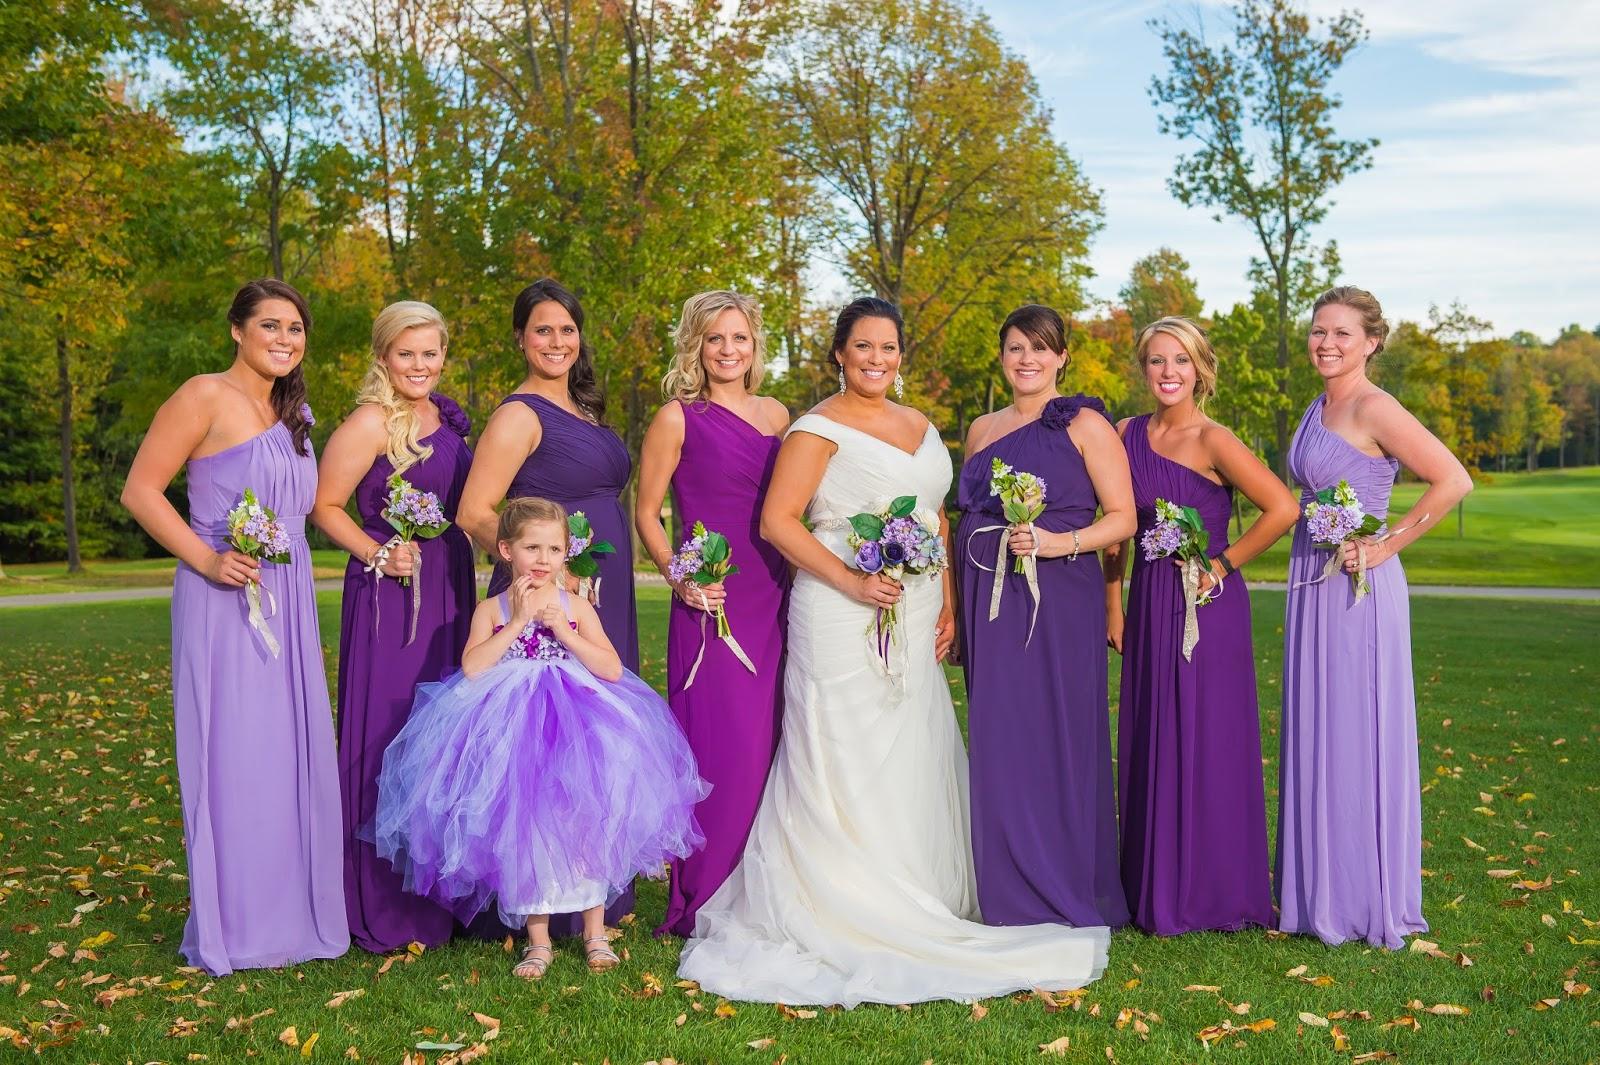 Bridesmaid Dresses // Wedding Wednesday | Dream Big & Buy The Shoes